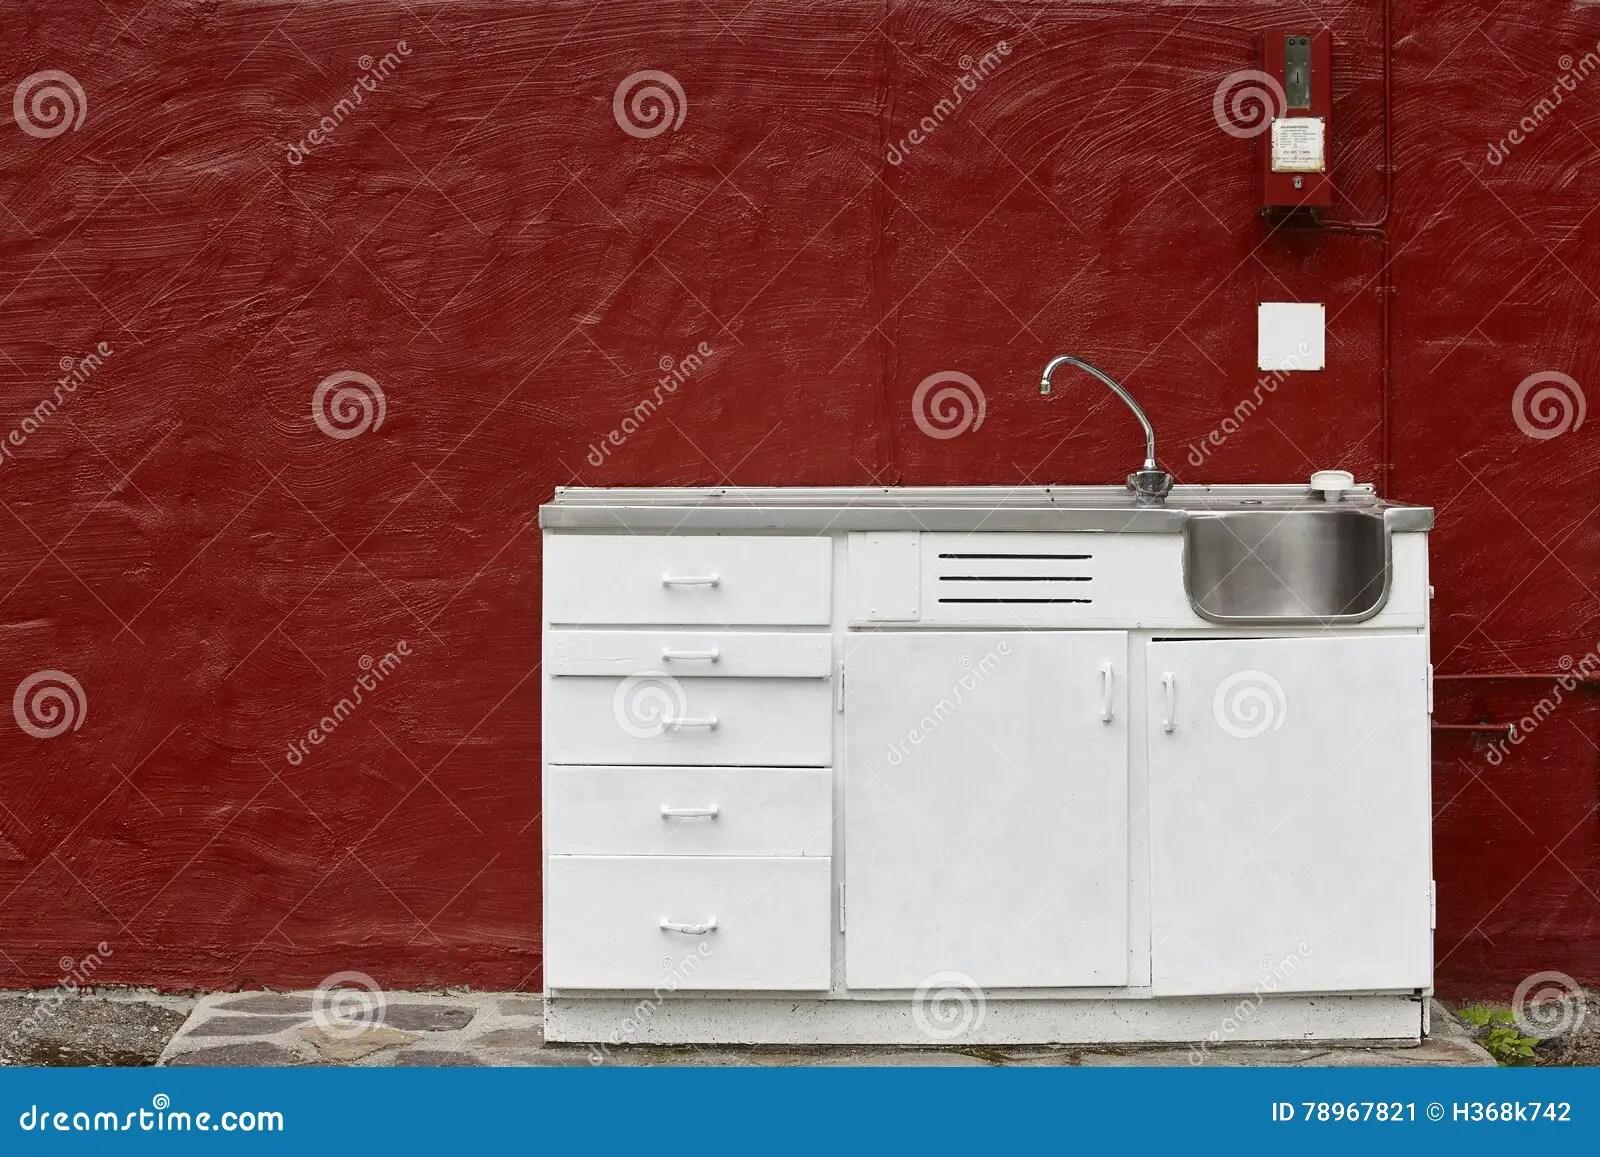 farmhouse kitchen faucet samsung appliance set 室外厨柜水槽和龙头在红色墙壁库存图片 图片包括有清洁 陆运 肥皂 室外厨柜水槽和龙头在红色墙壁